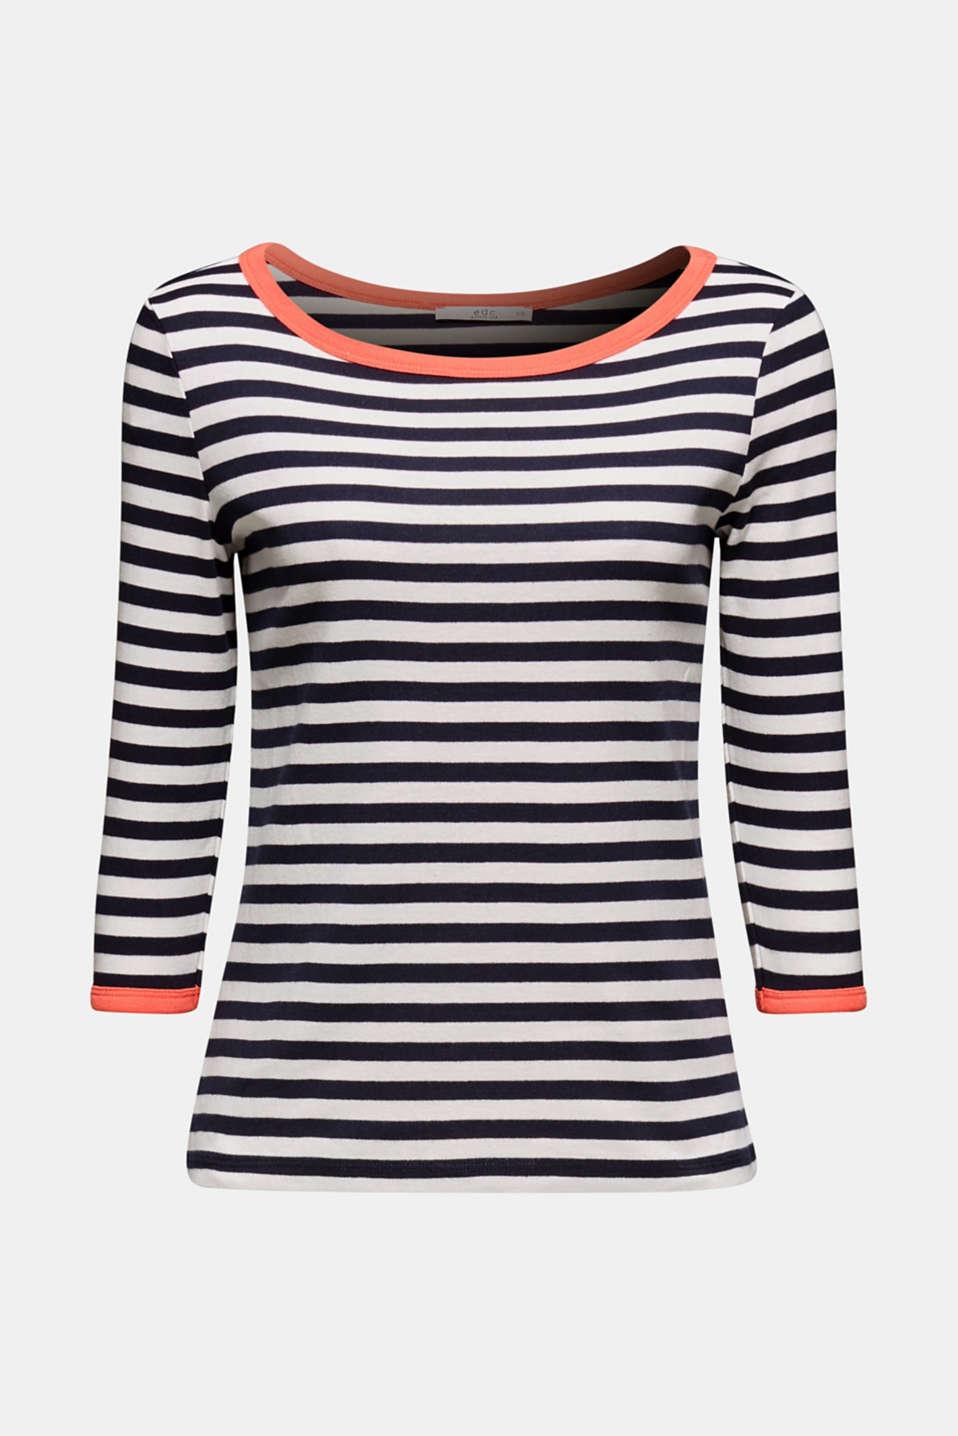 Accent trim T-shirt, 100% cotton, NAVY, detail image number 5